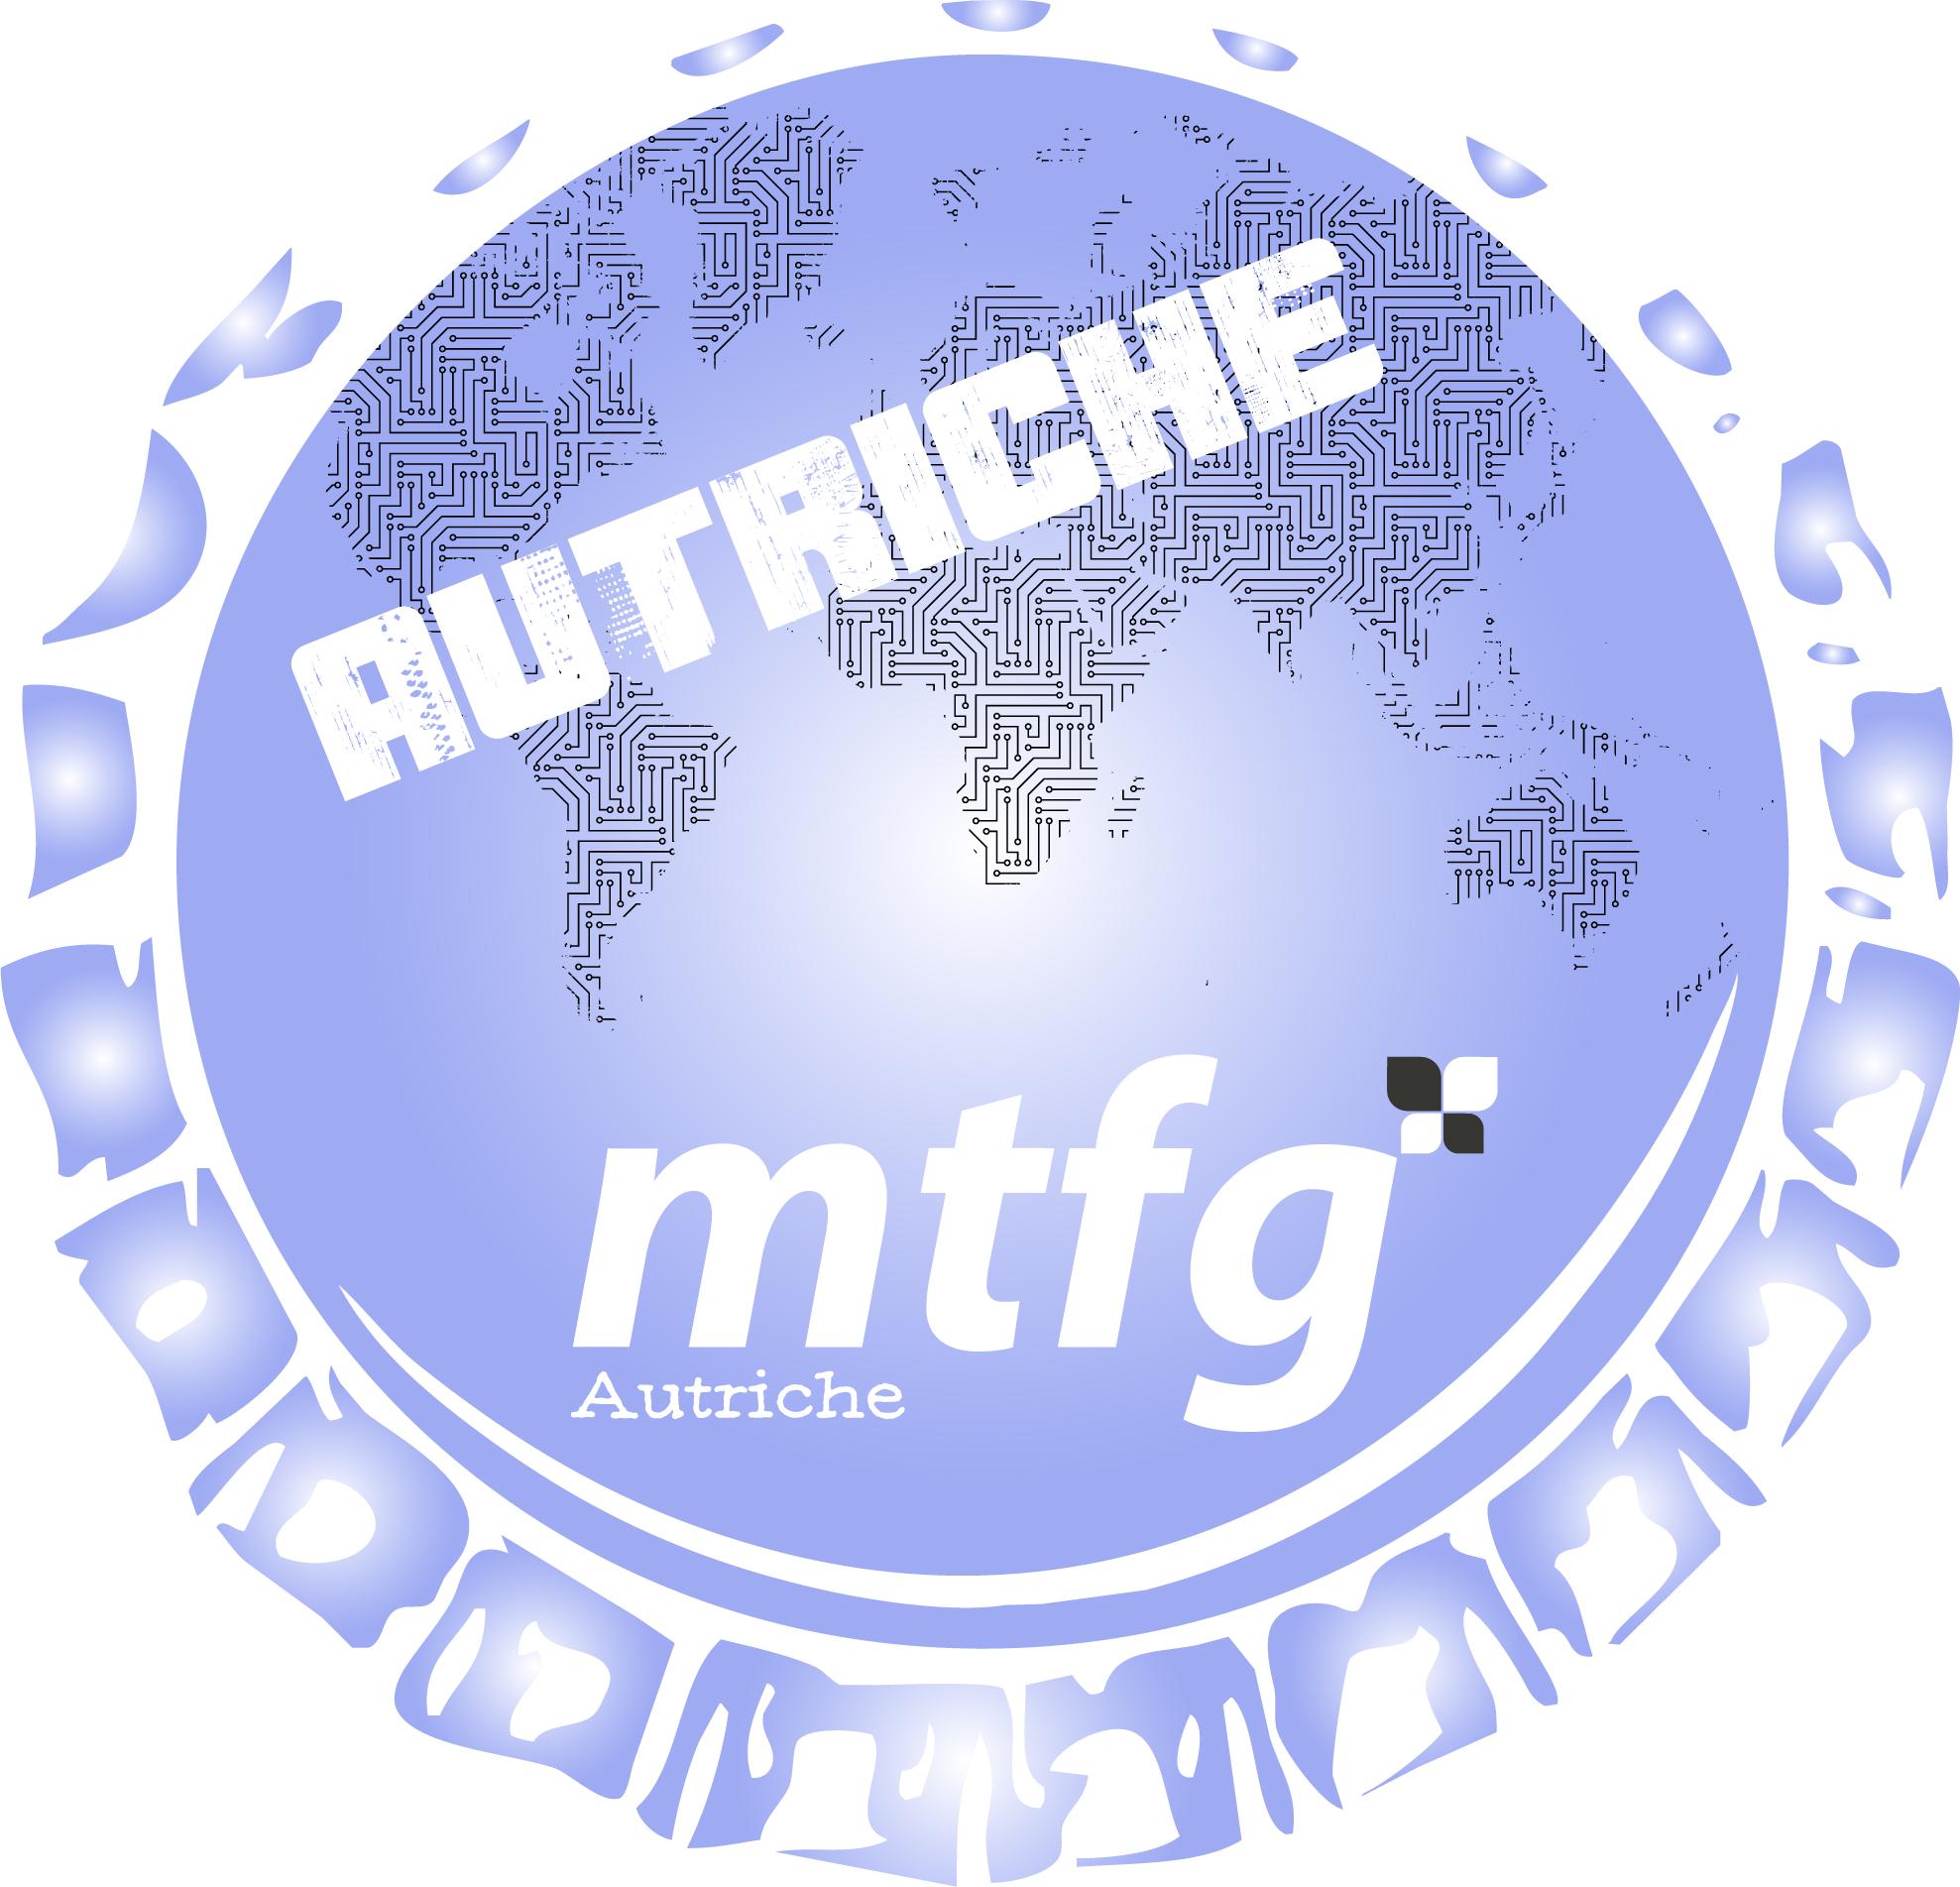 MTFG Autriche